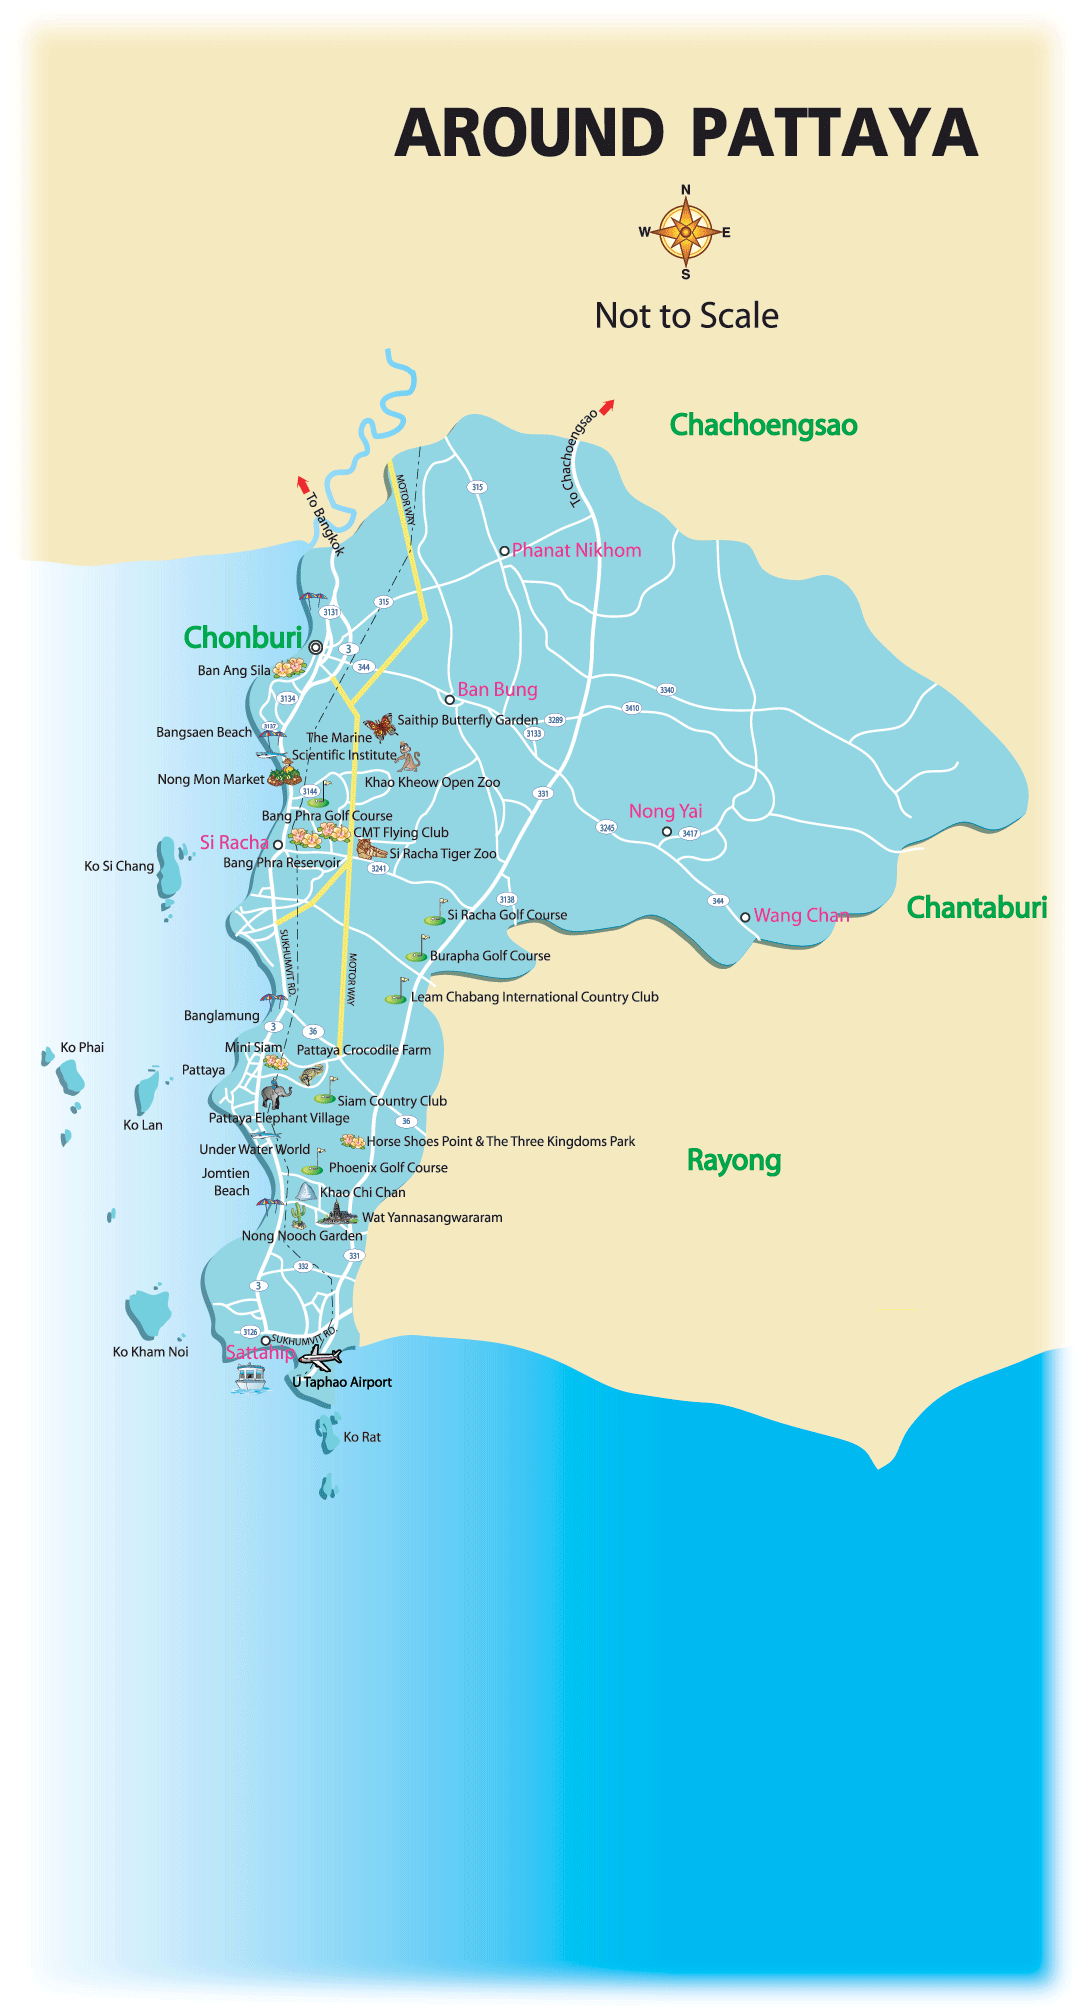 Chonburi maps